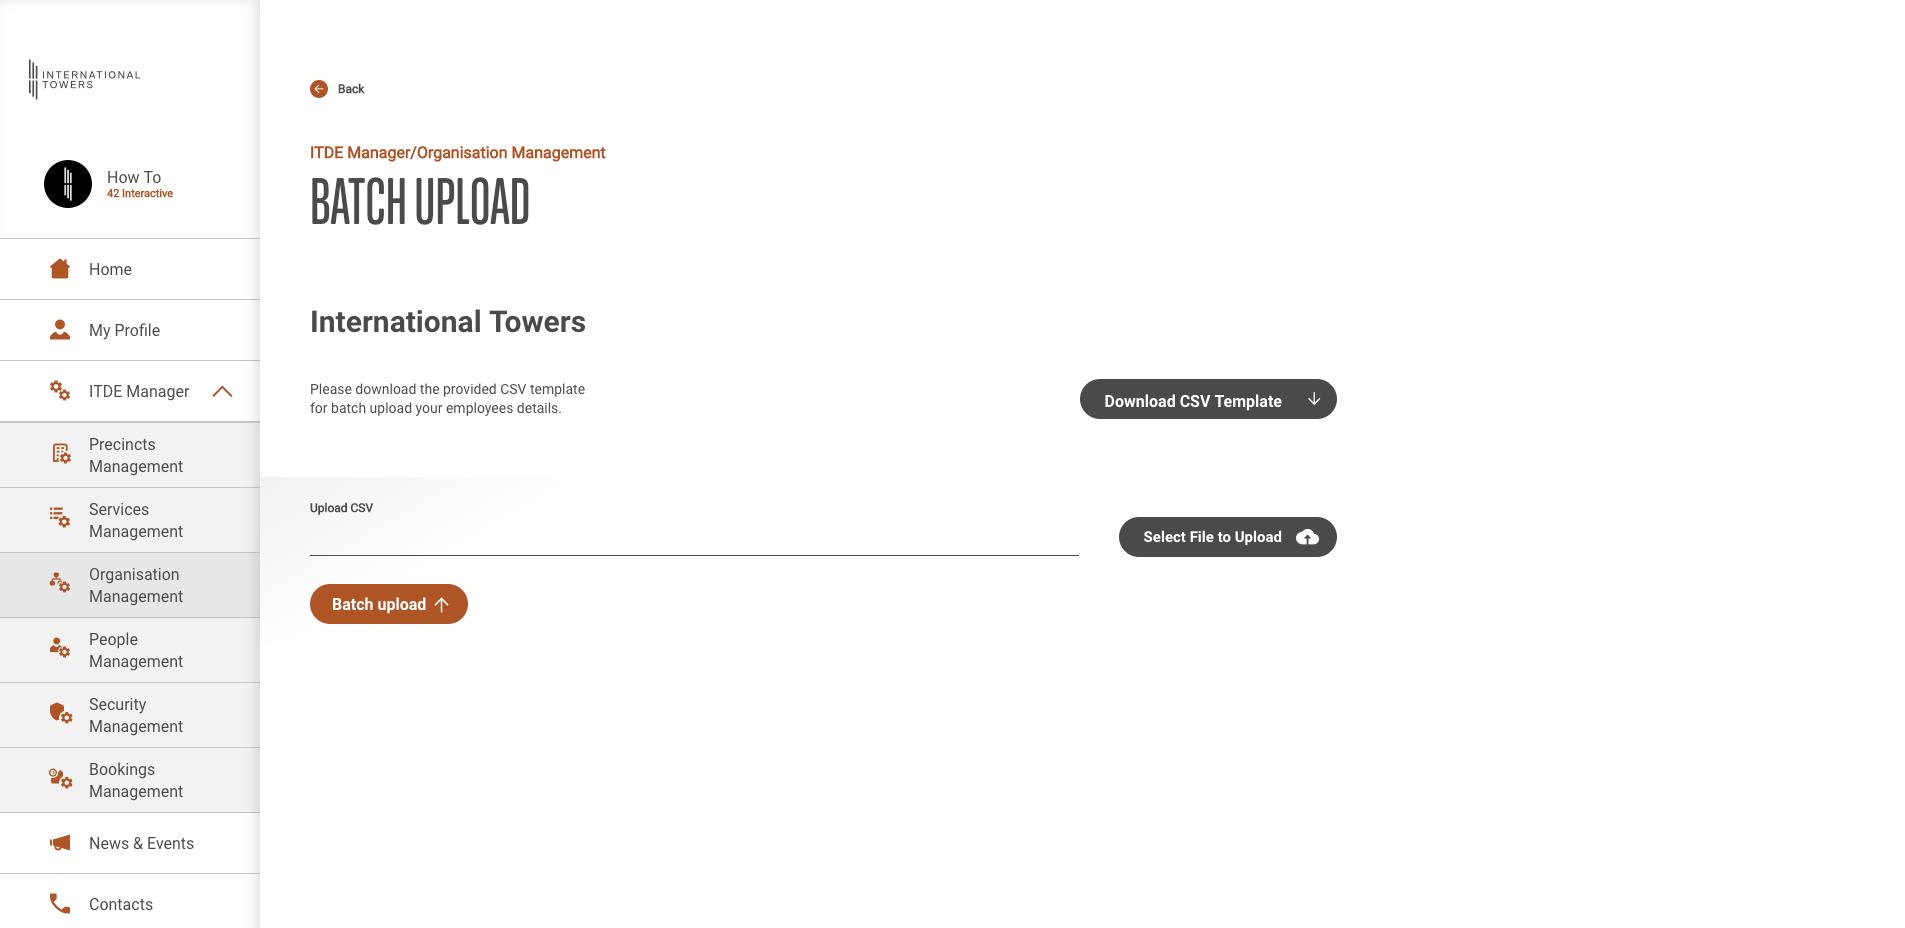 ITDE-organisationmanagement-batchupload2